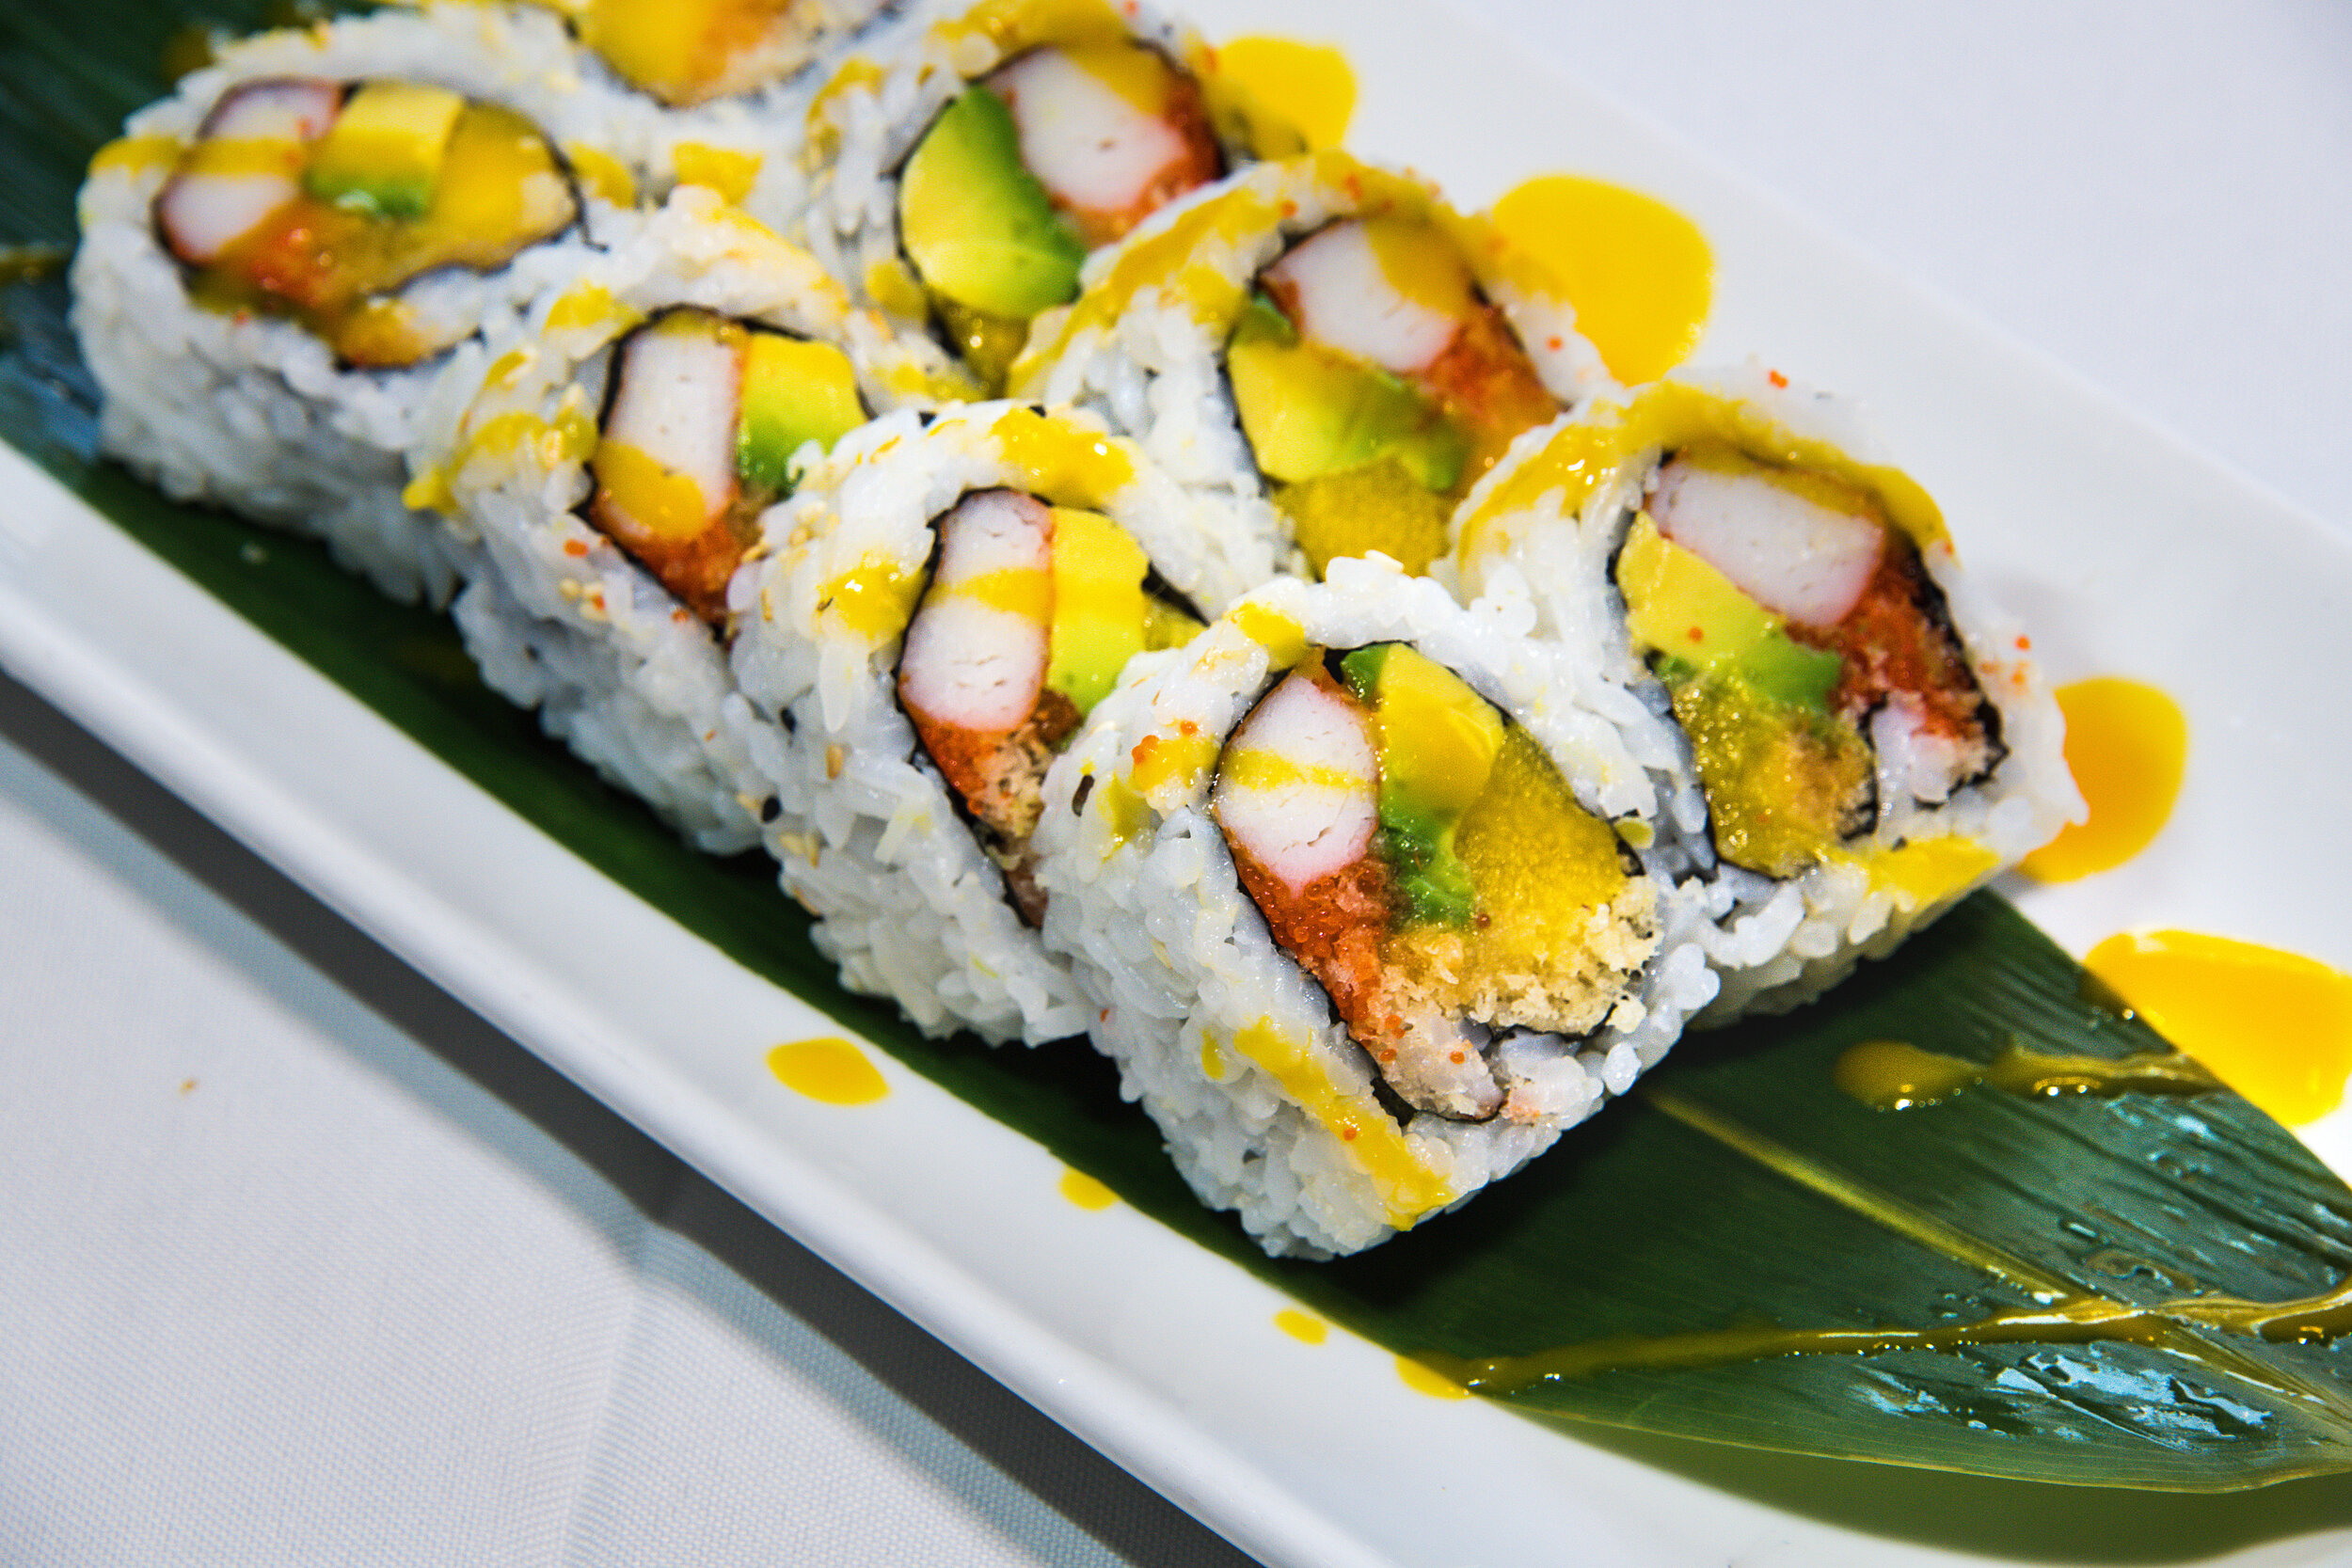 Crispy Thai Roll (8) $9.99 Crab, Fish Eggs, Mango, Avocado, Spicy Mayo & Mango Sauce.